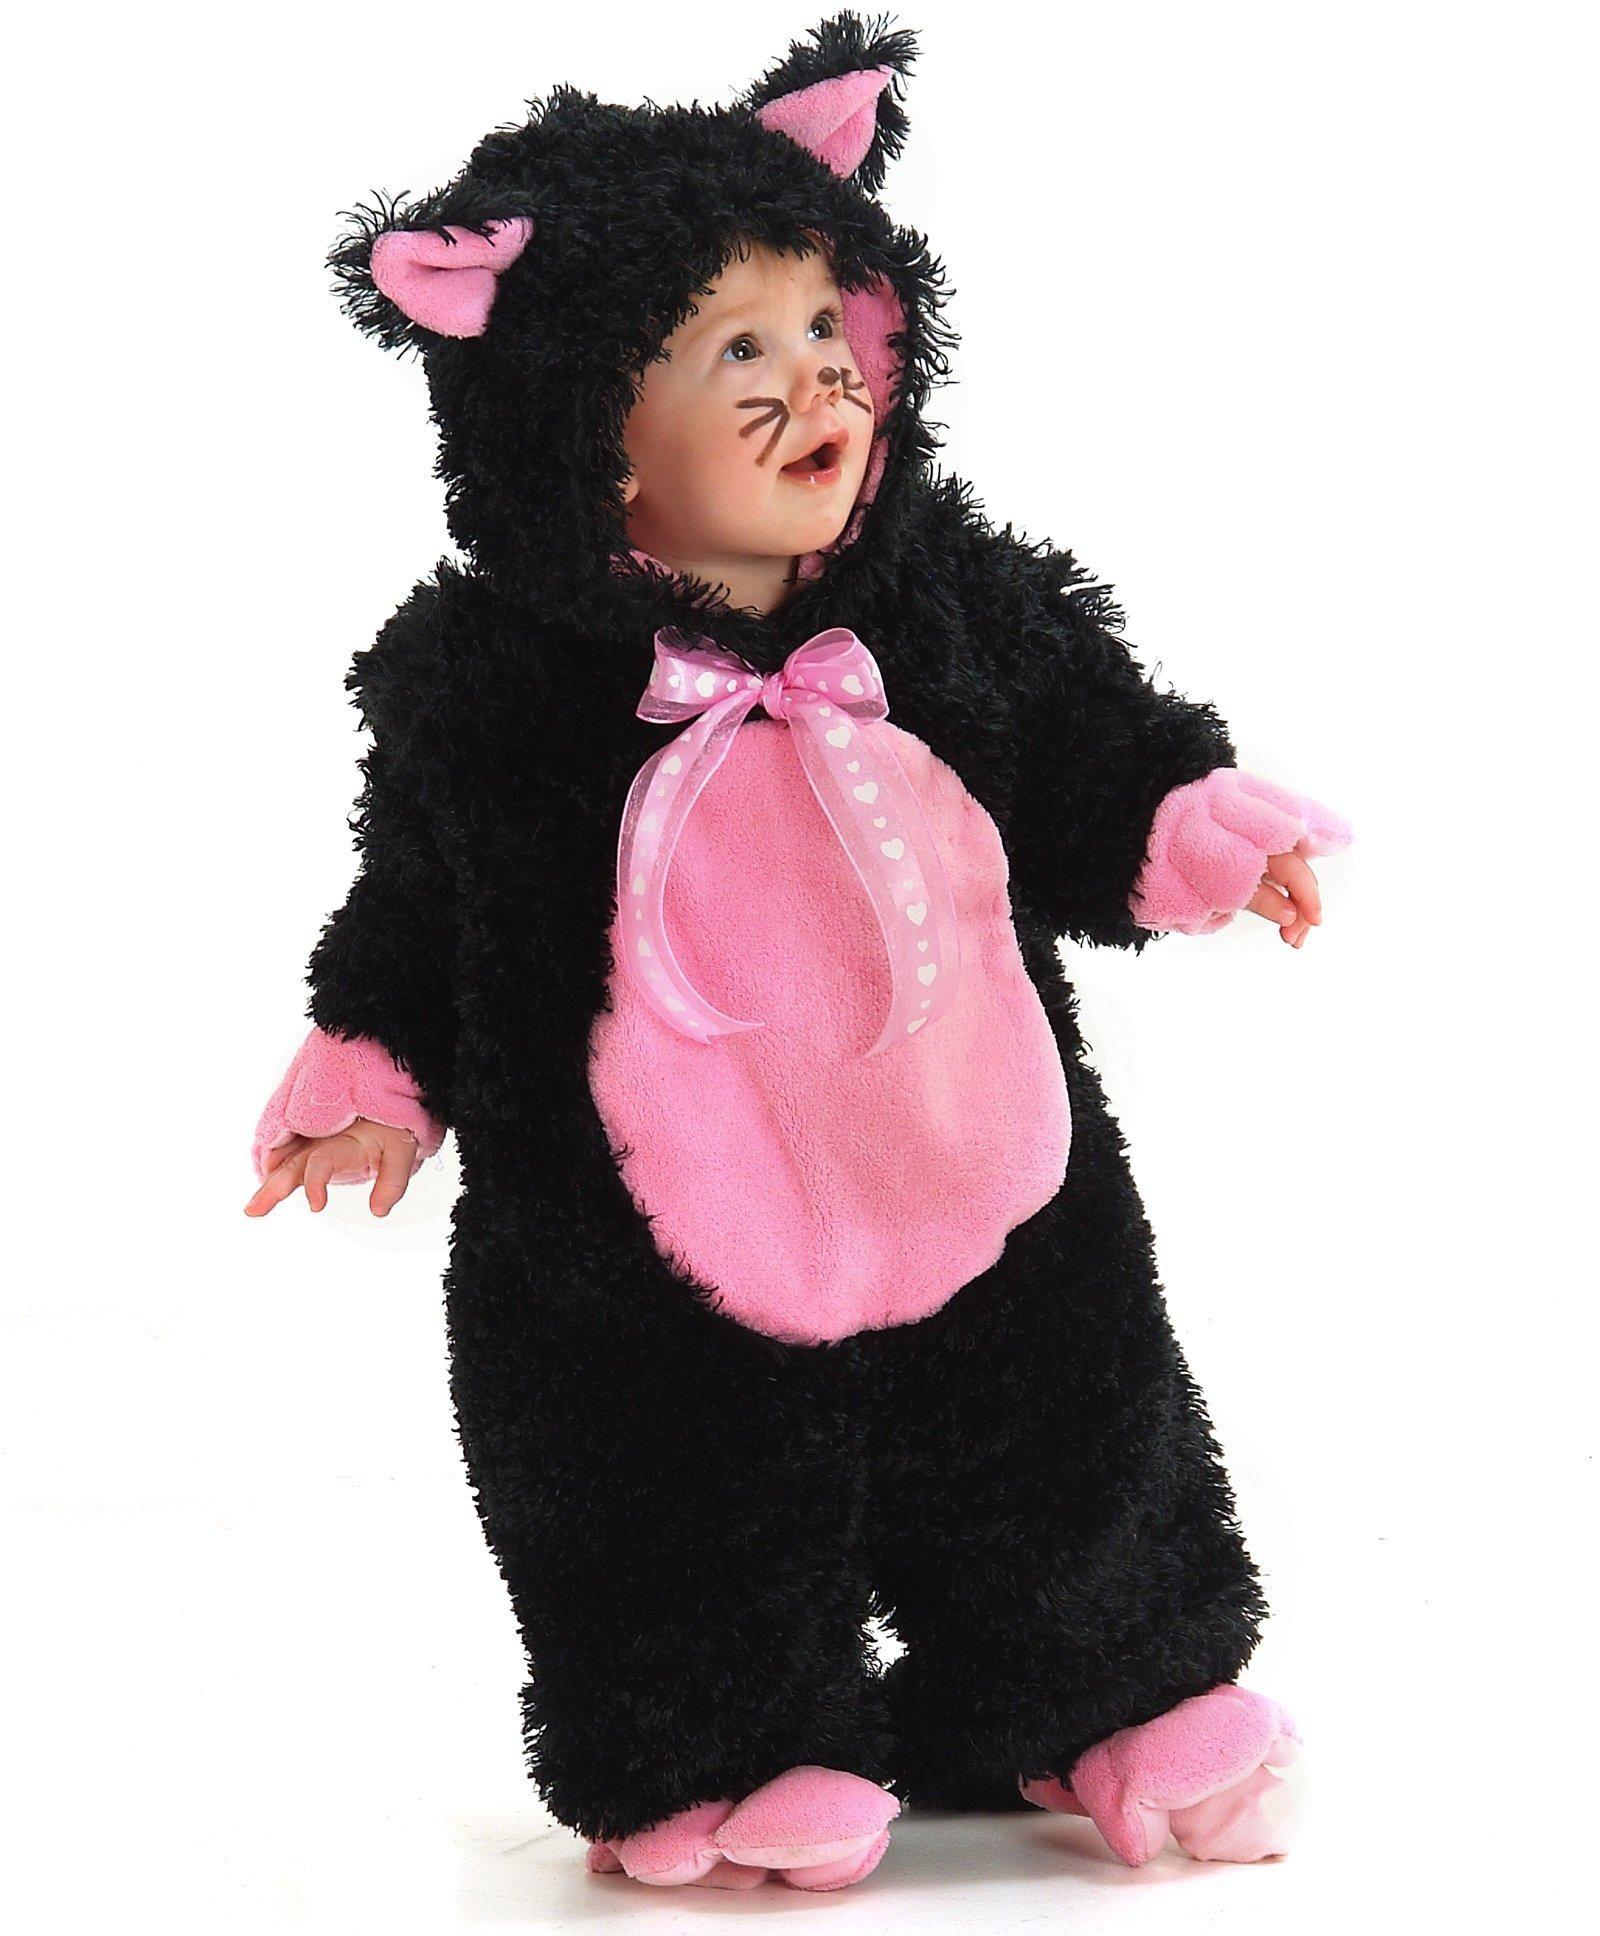 Black Kitty Infant / Toddler Costume  sc 1 st  Pinterest & Black Kitty Infant / Toddler Costume | Black kitty Toddler costumes ...